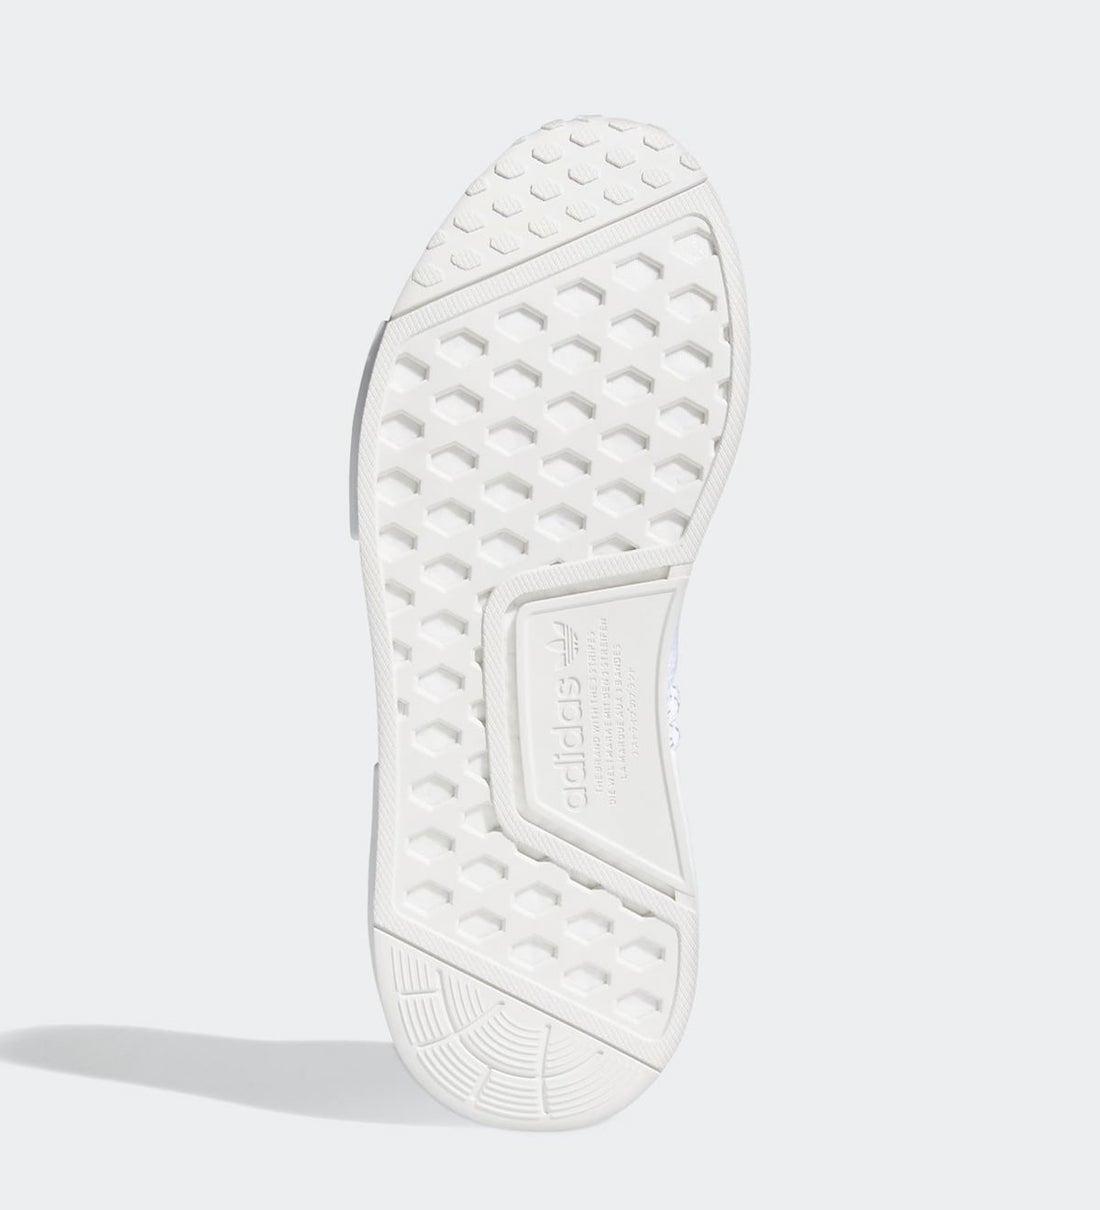 Pharrell x adidas NMD Hu White GY0092 5